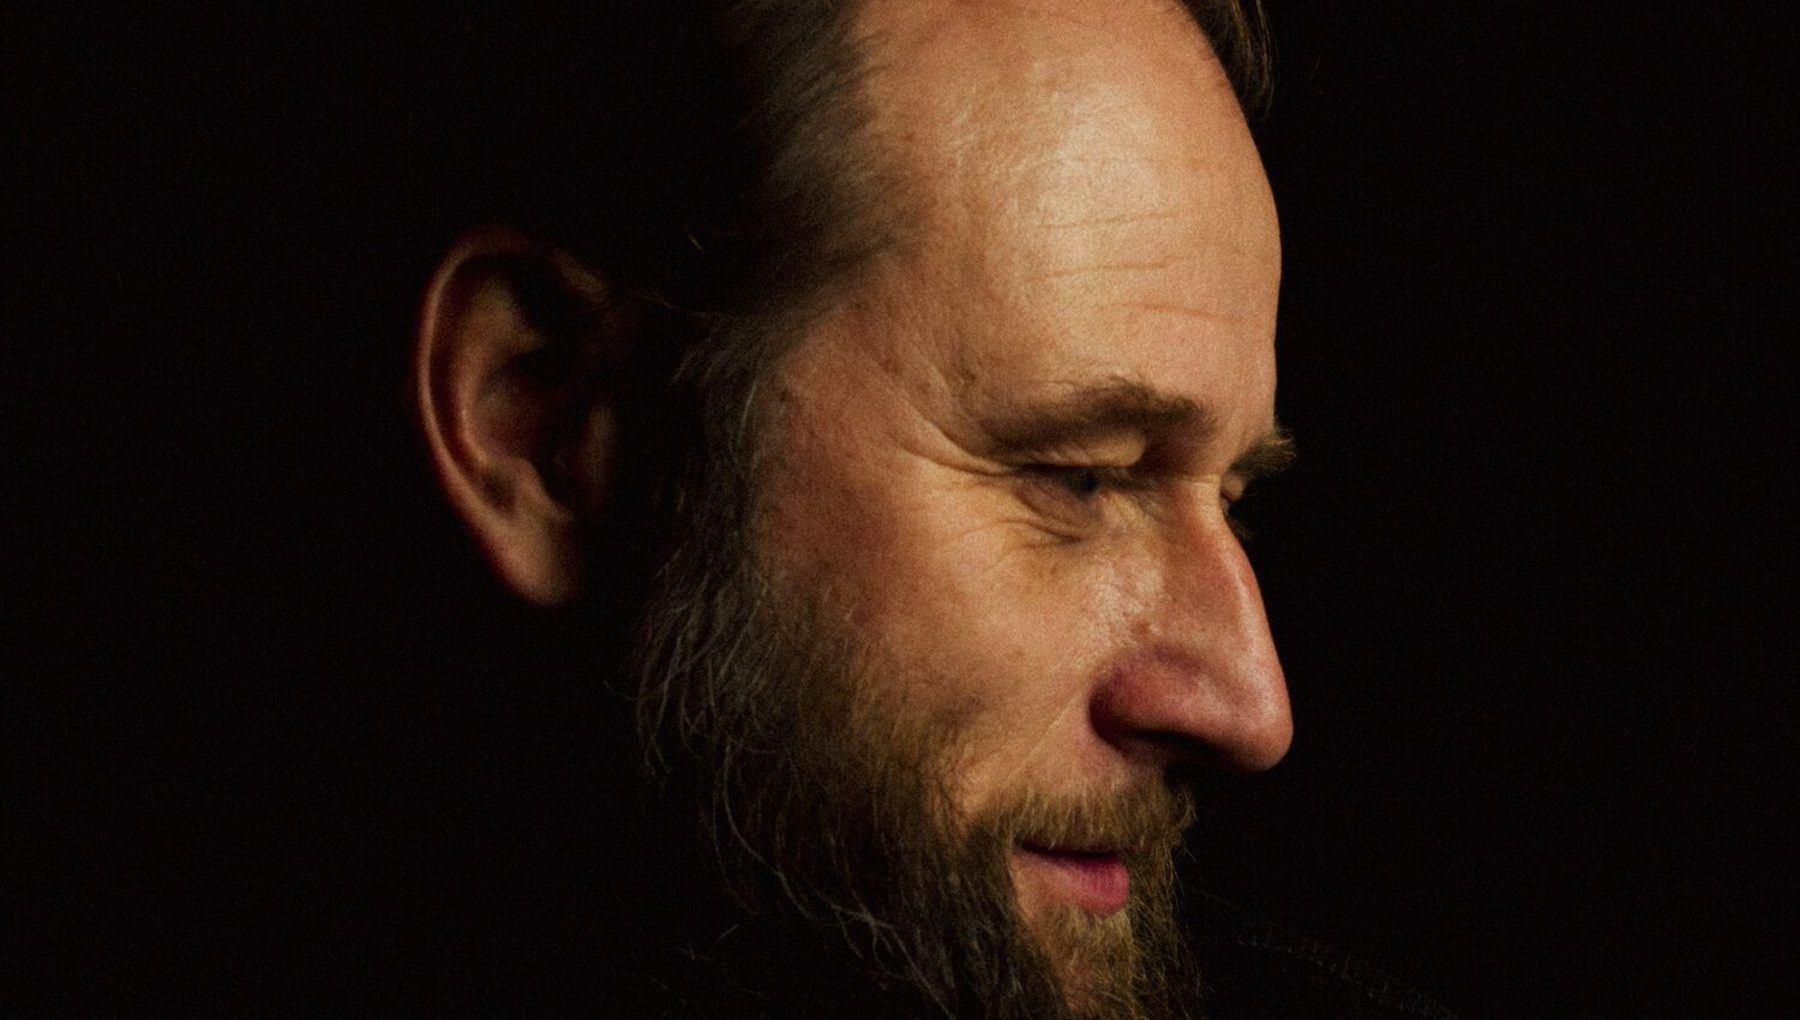 Lars K. Lande